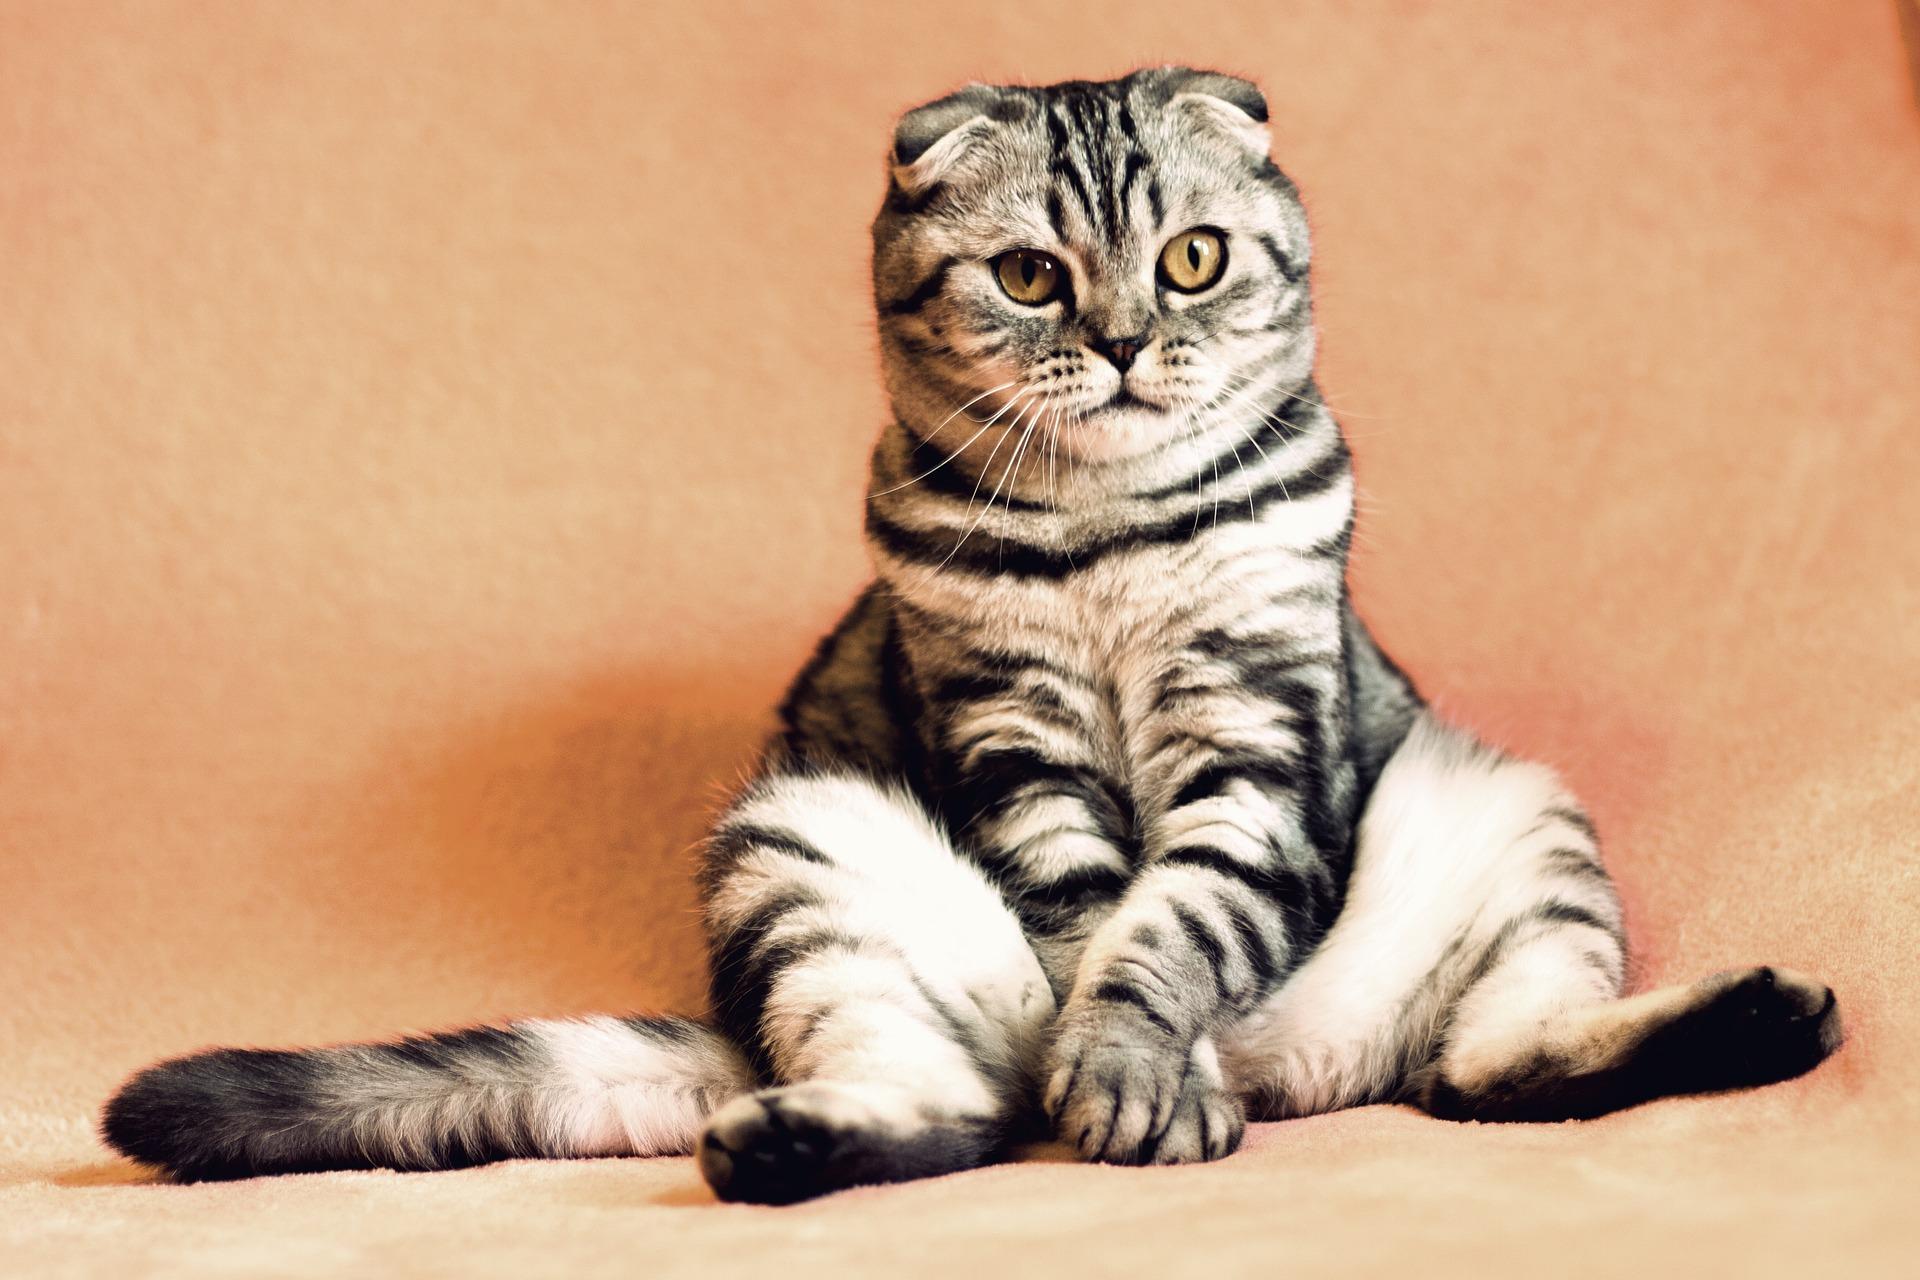 cat sitting like human